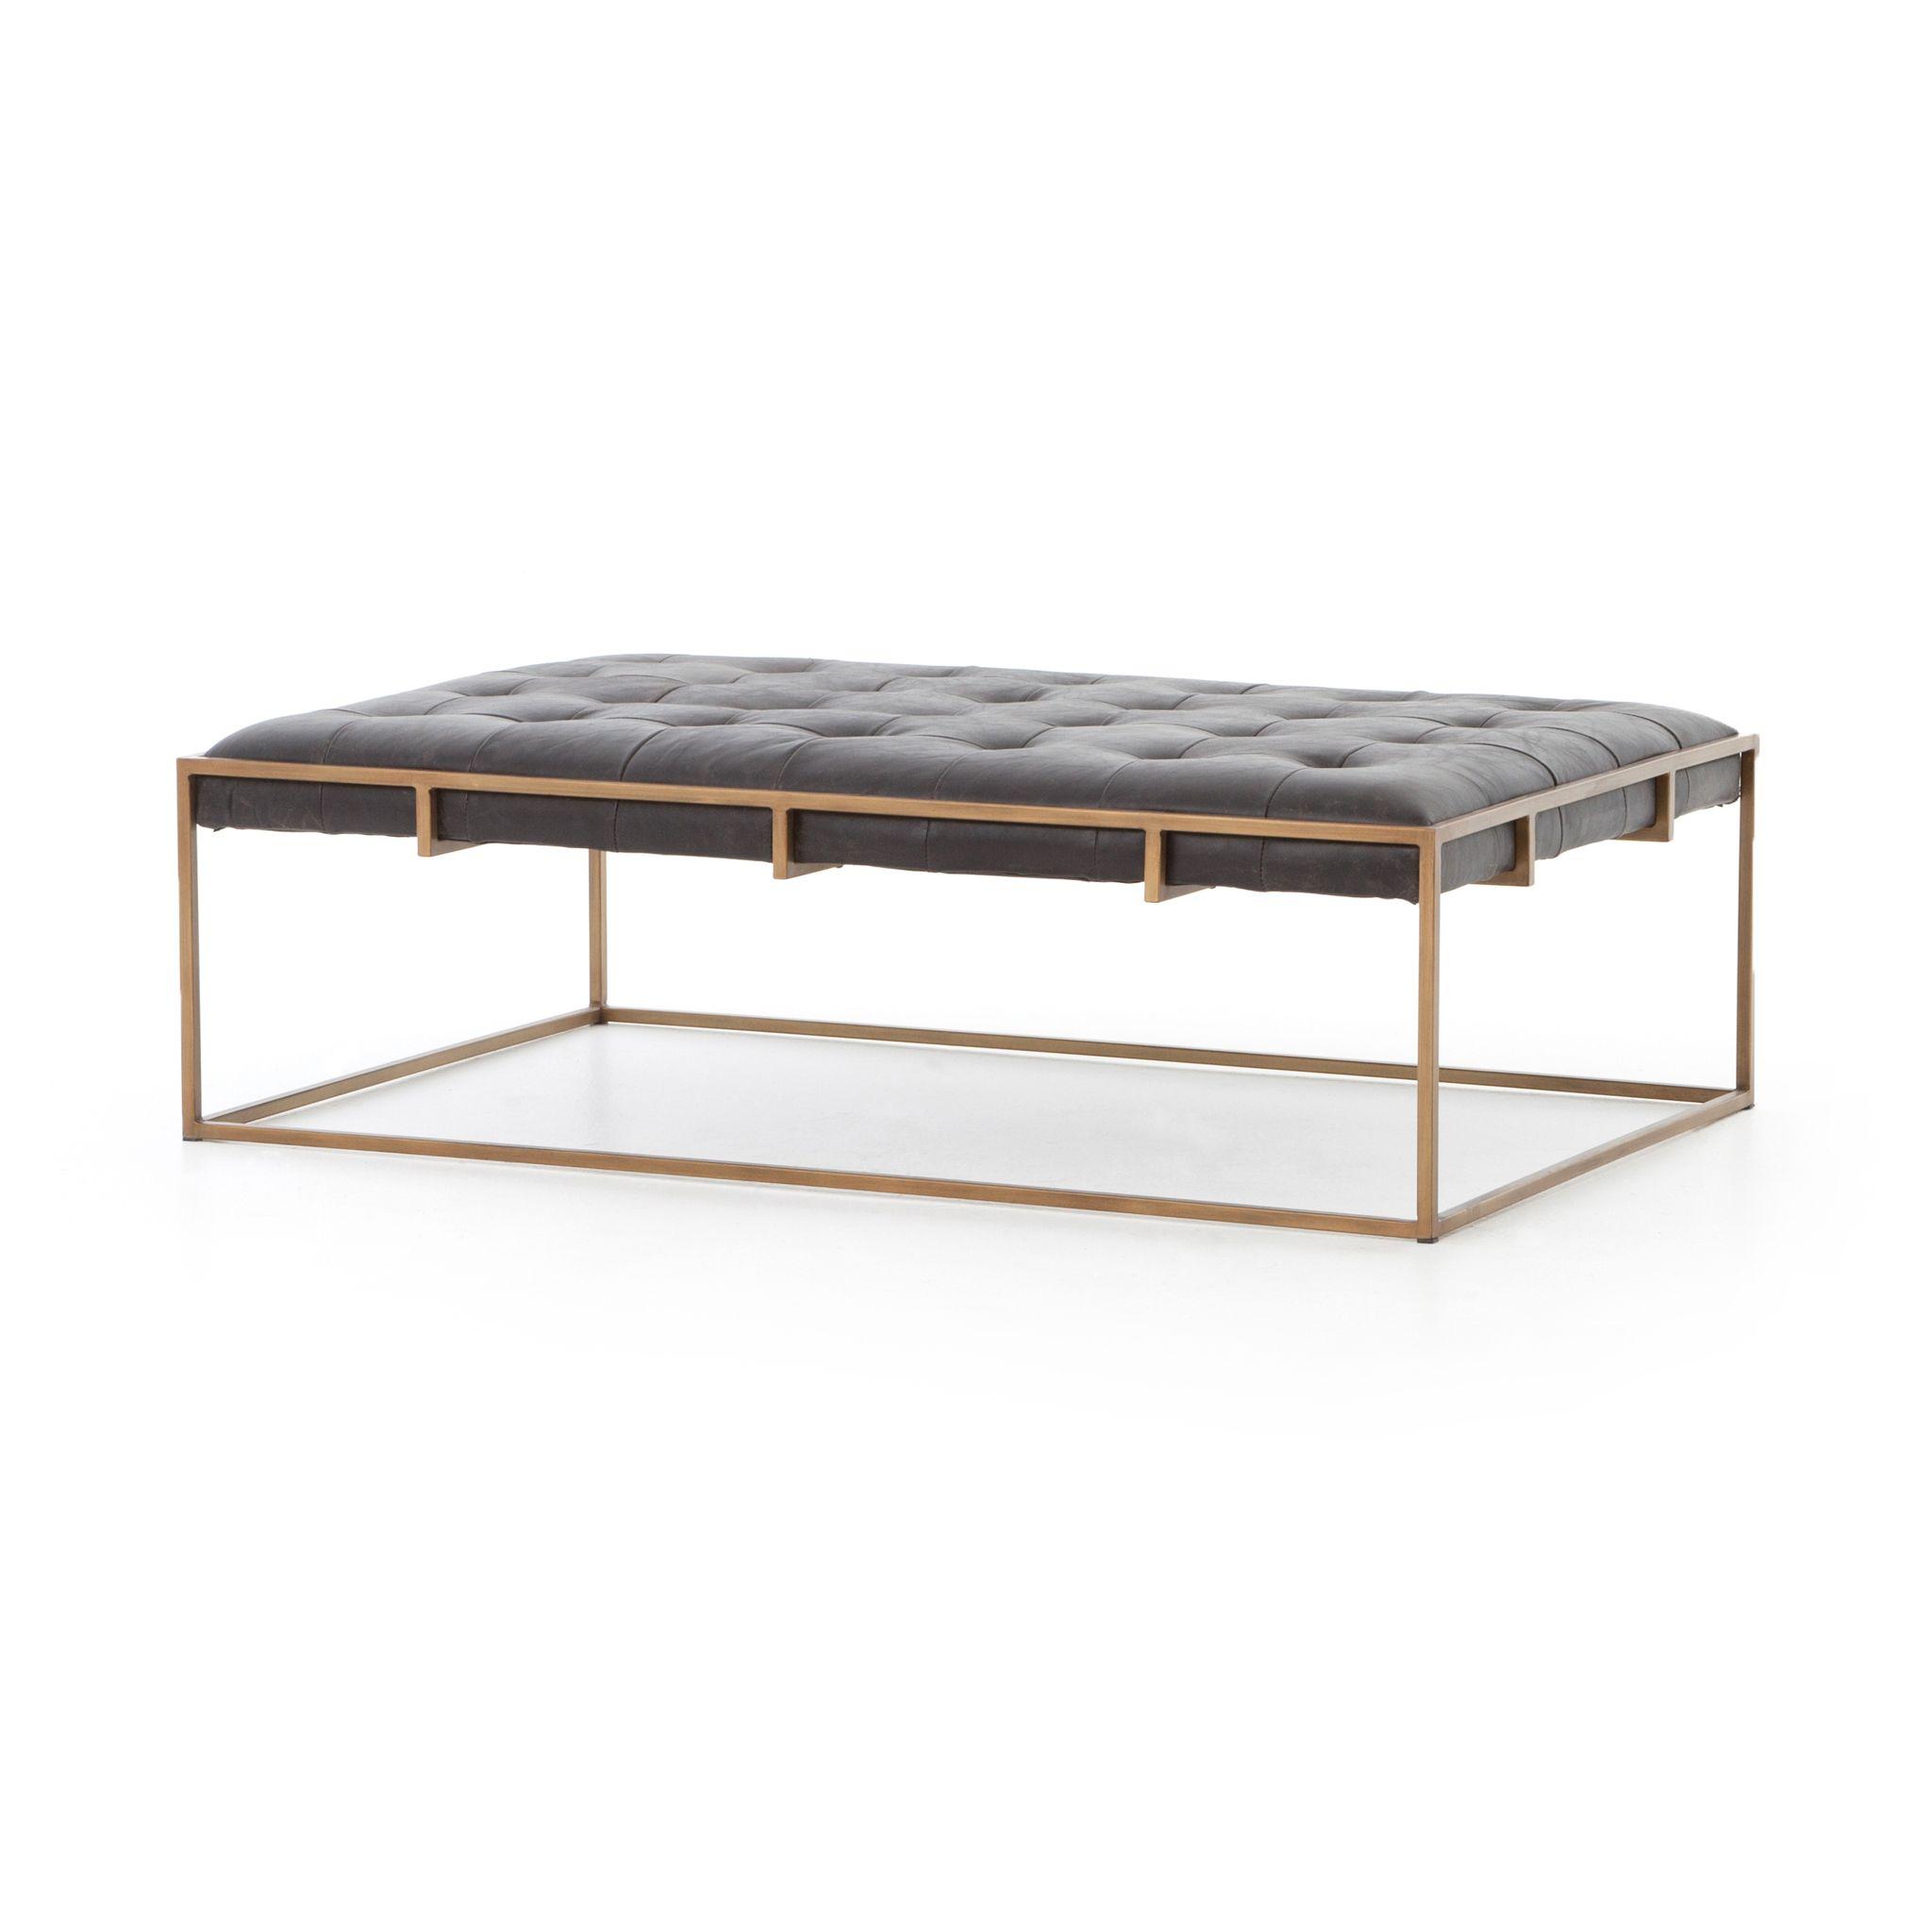 Olwina Leather Coffee Table Coffee Table Leather Coffee Table Ottoman Coffee Table [ 2048 x 2048 Pixel ]